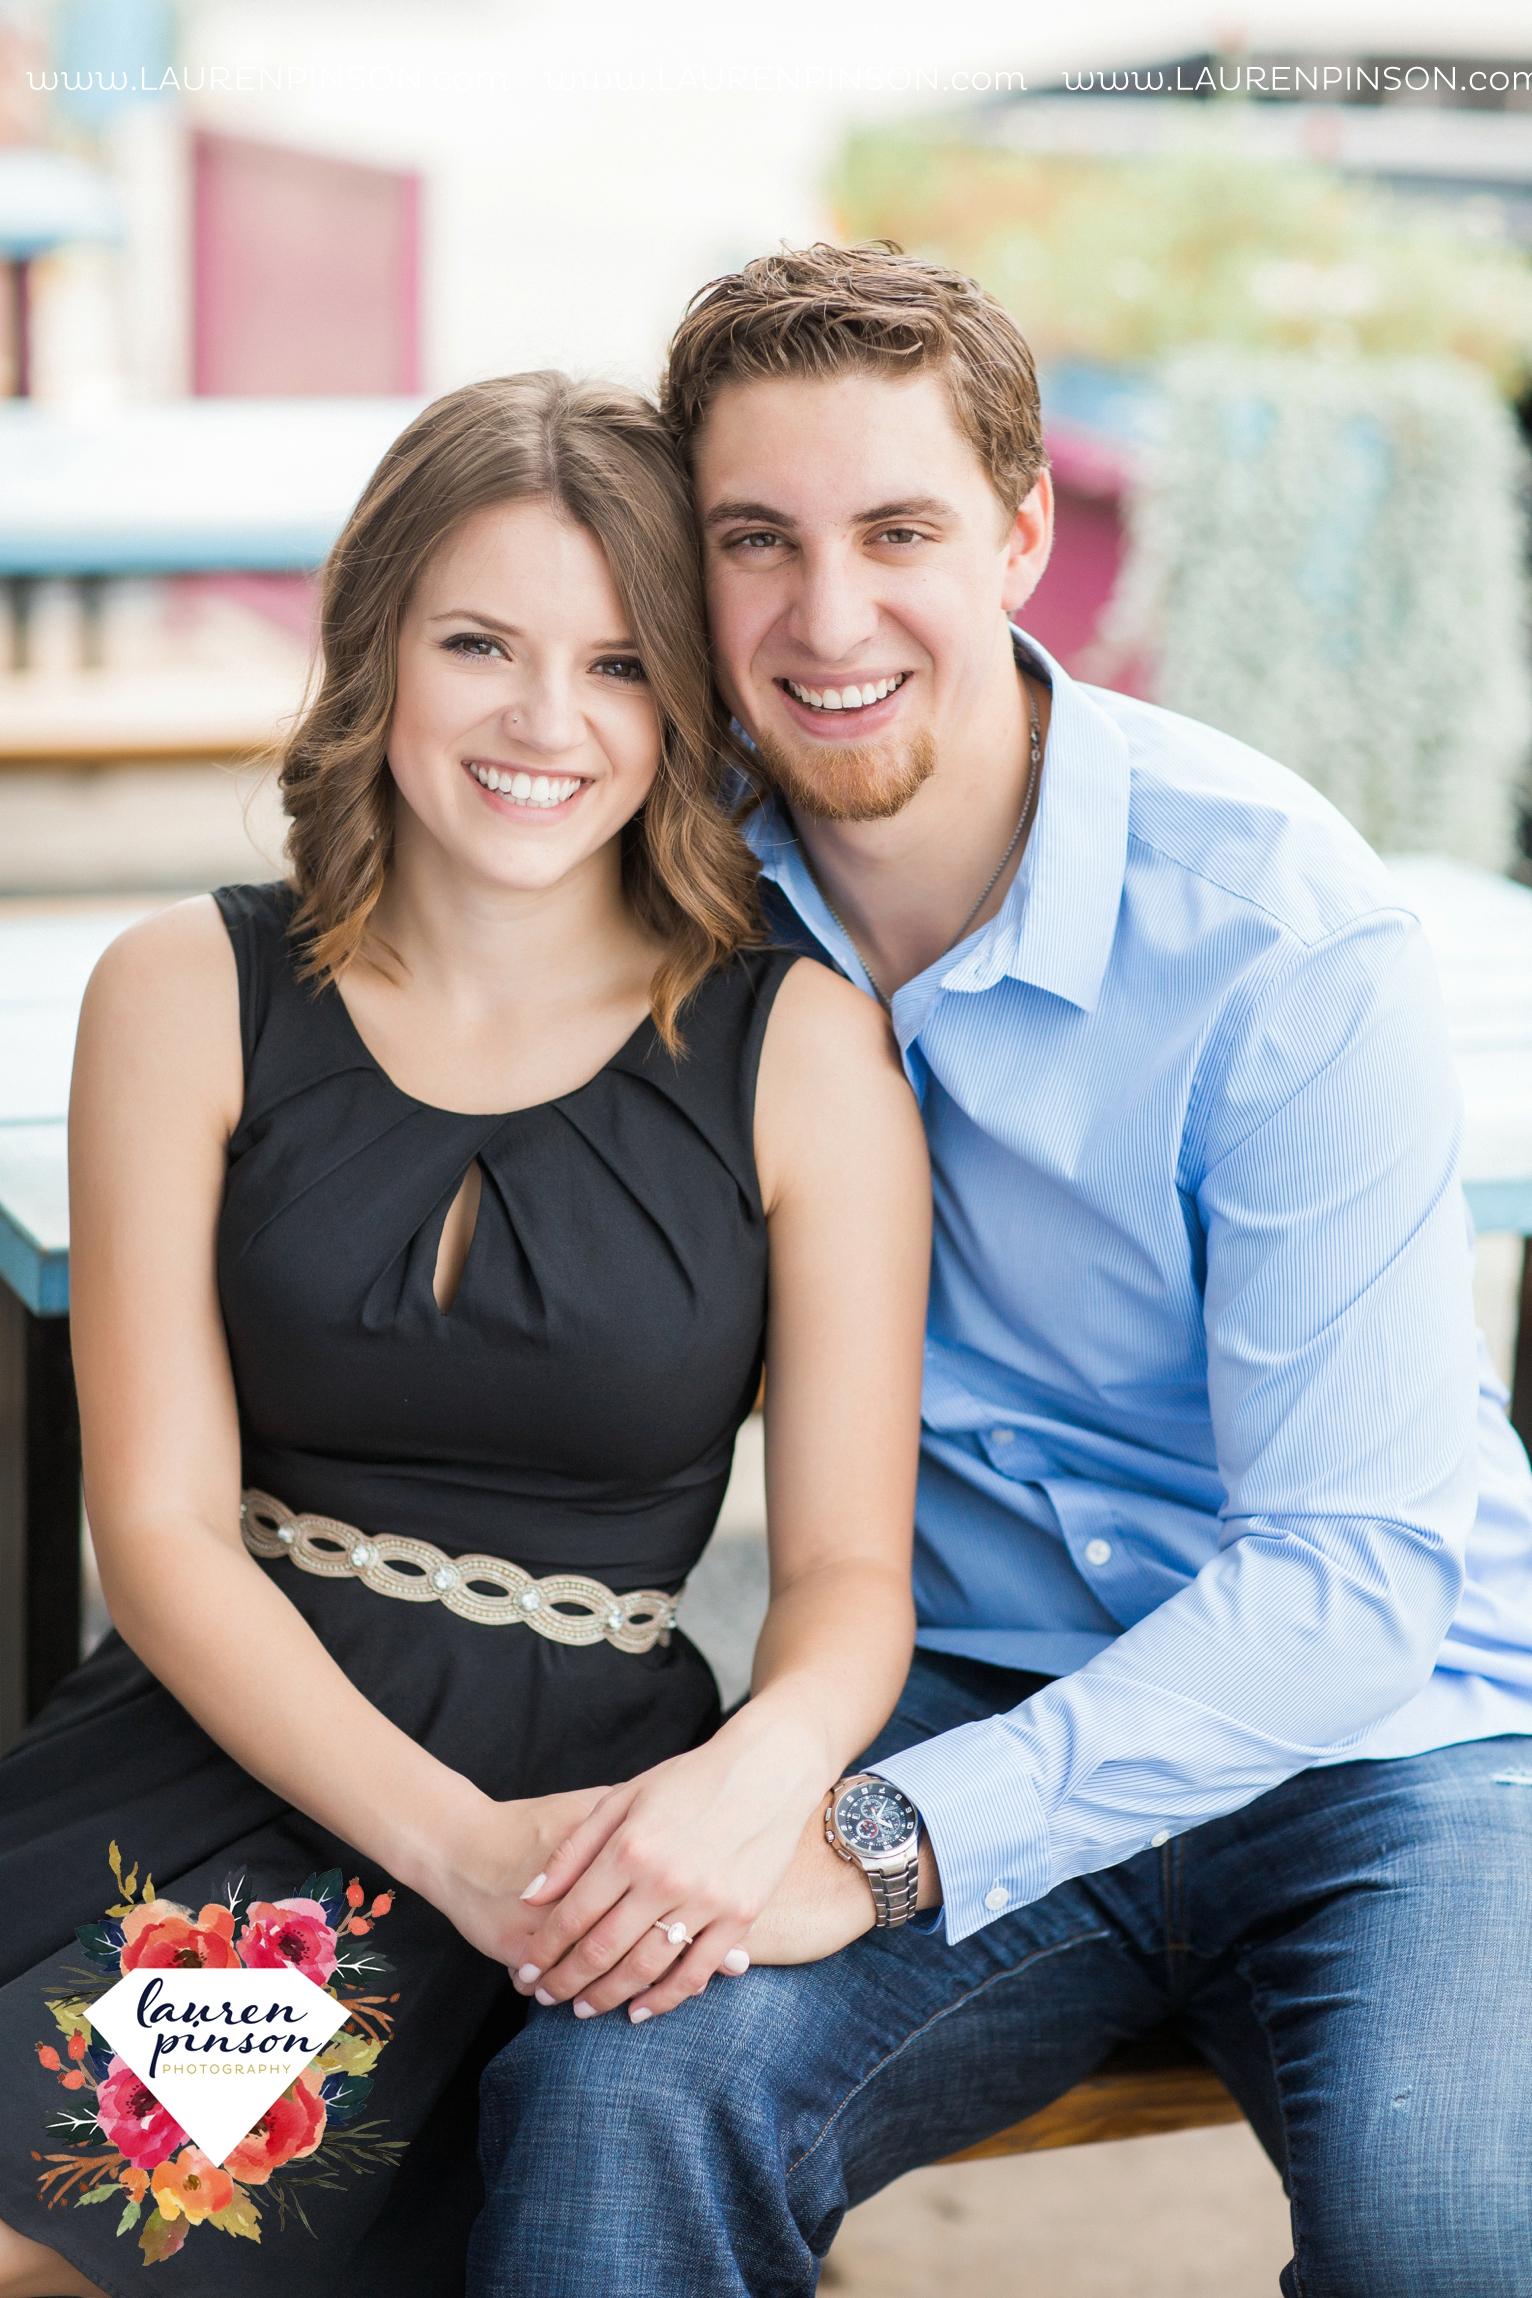 austin-texas-engagement-session-photography-by-wichita-falls-wedding-photgraphy-lauren-pinson_1395.jpg